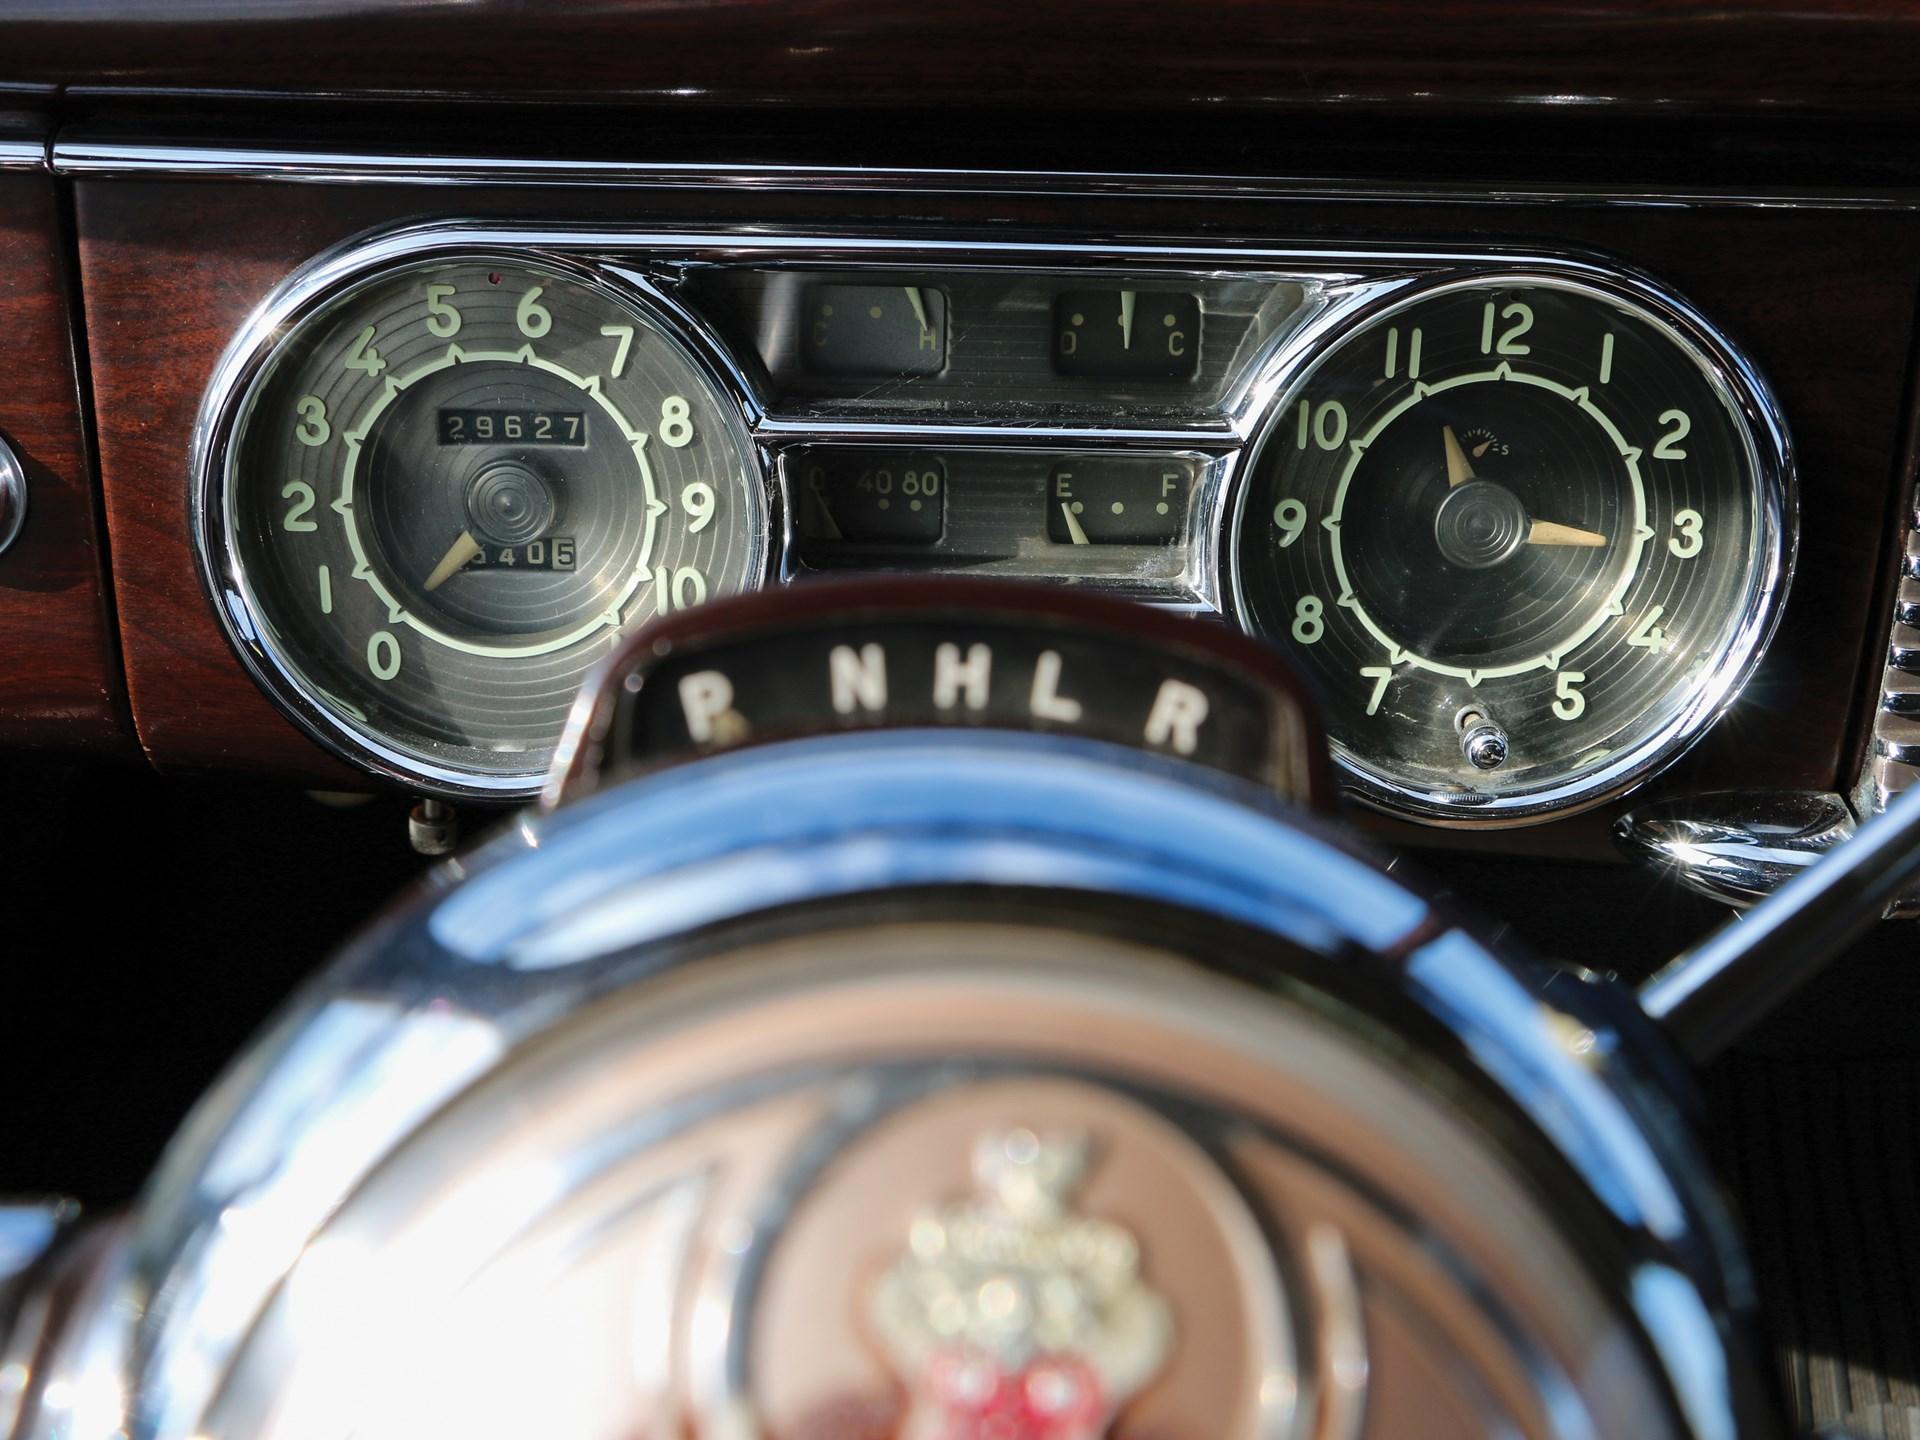 1950 Packard Deluxe Eight Sedan